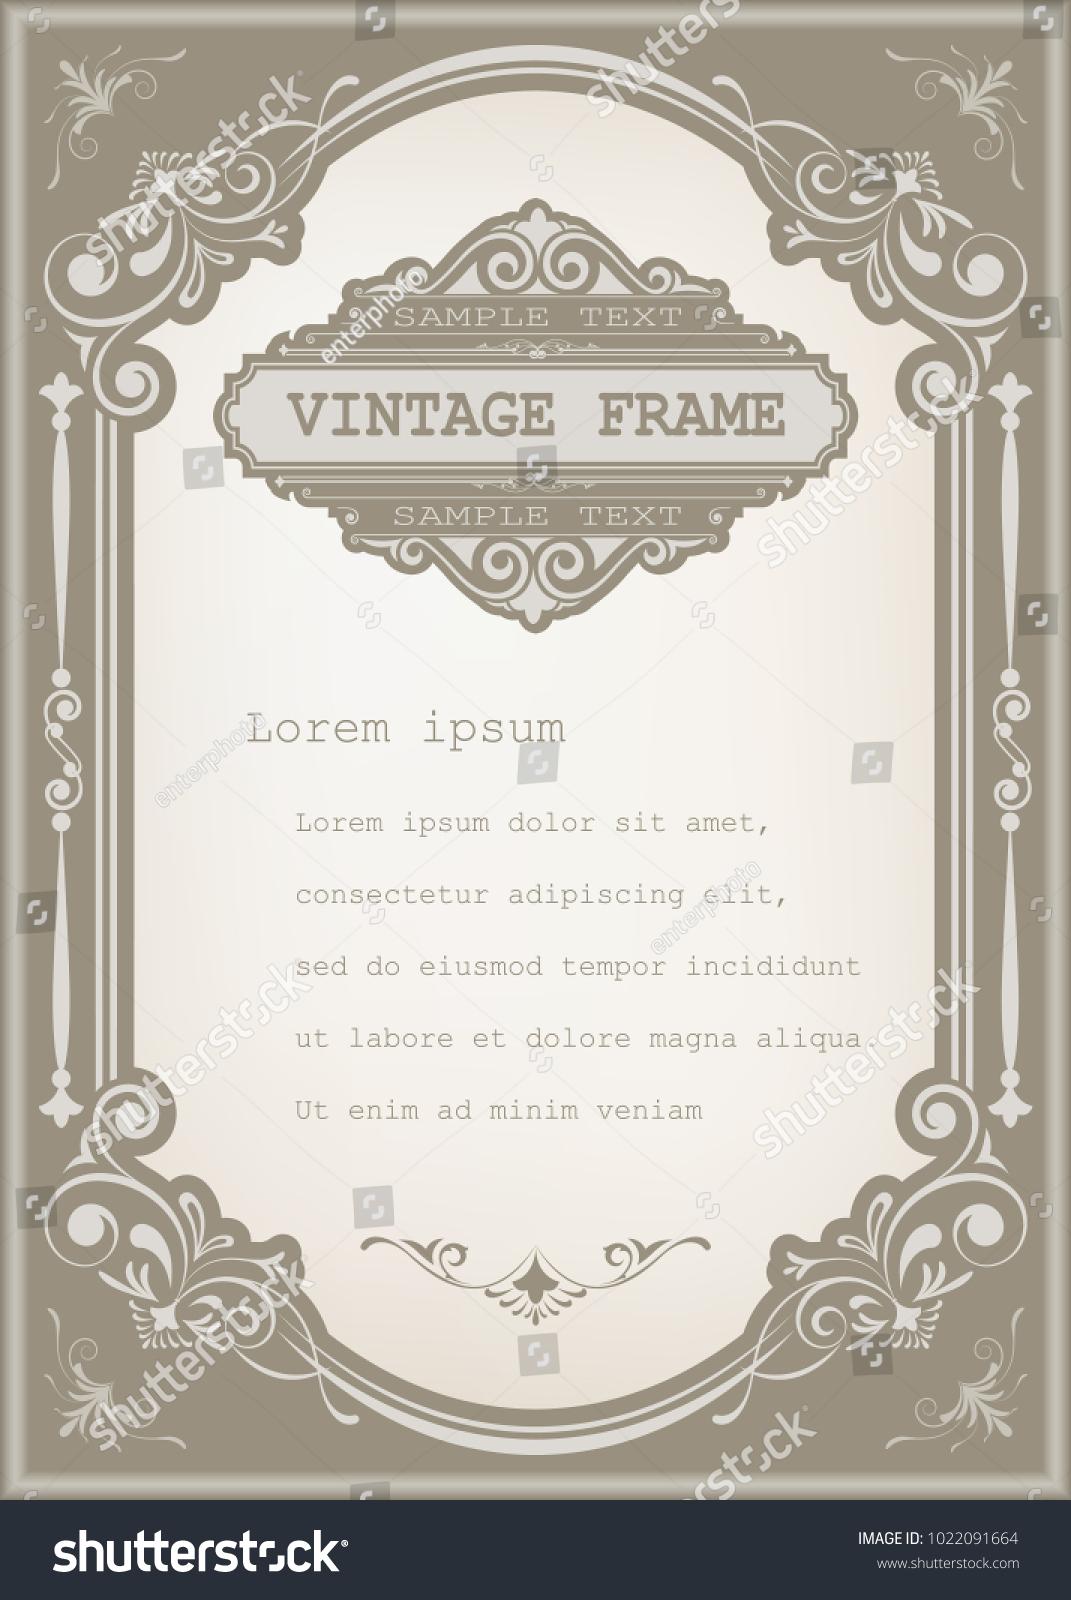 Vintage frame beautiful filigree decorative border stock vector vintage frame with beautiful filigree decorative border luxury greeting cardsvector illustration kristyandbryce Images